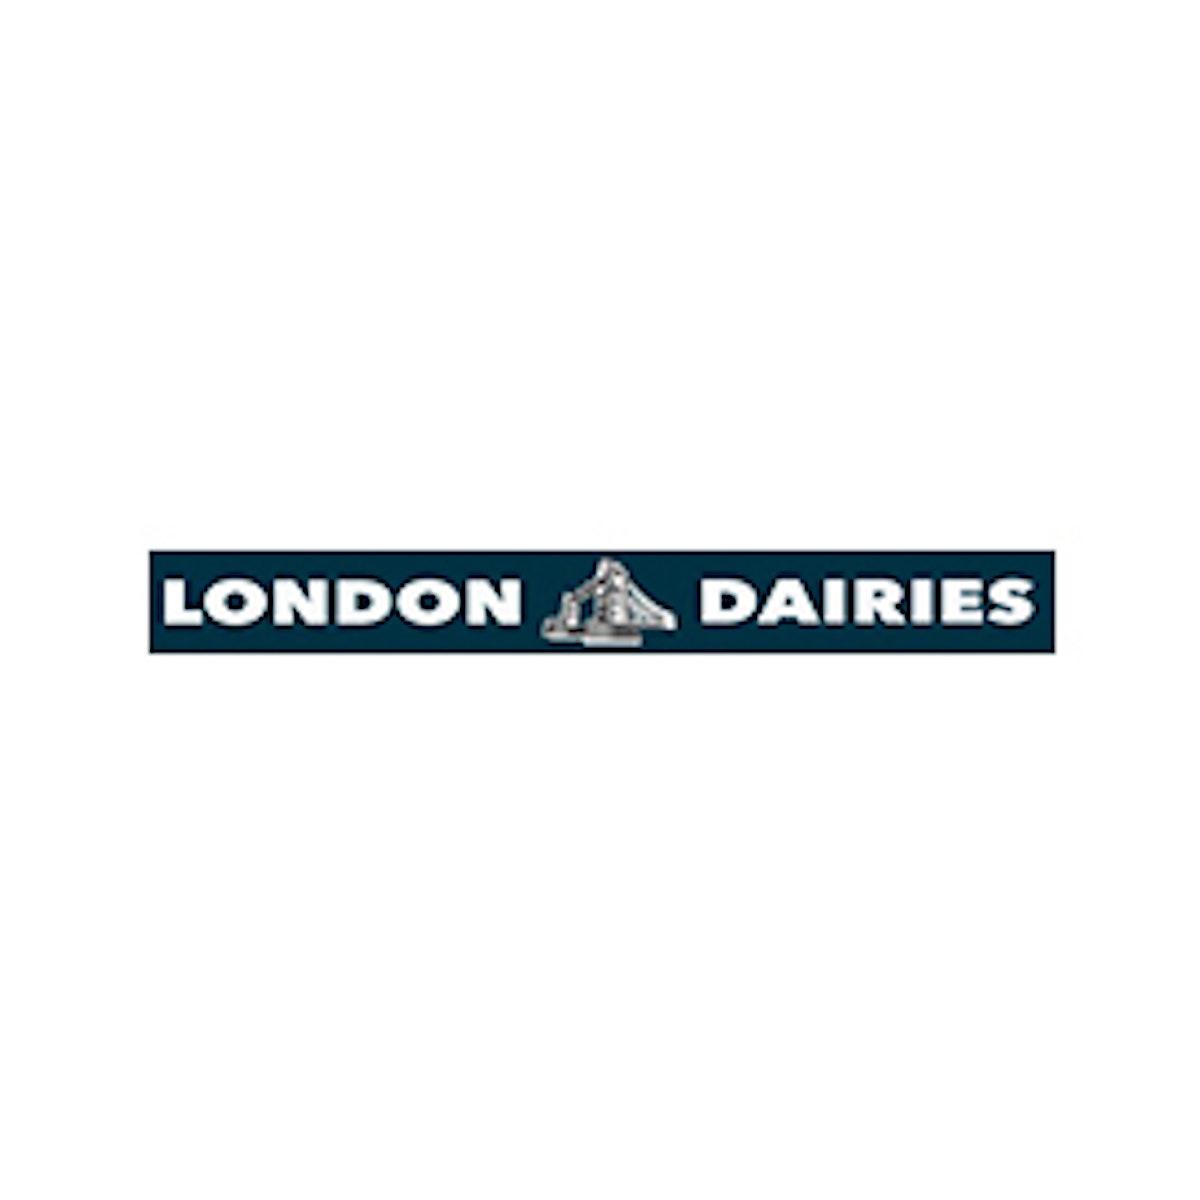 London Dairies